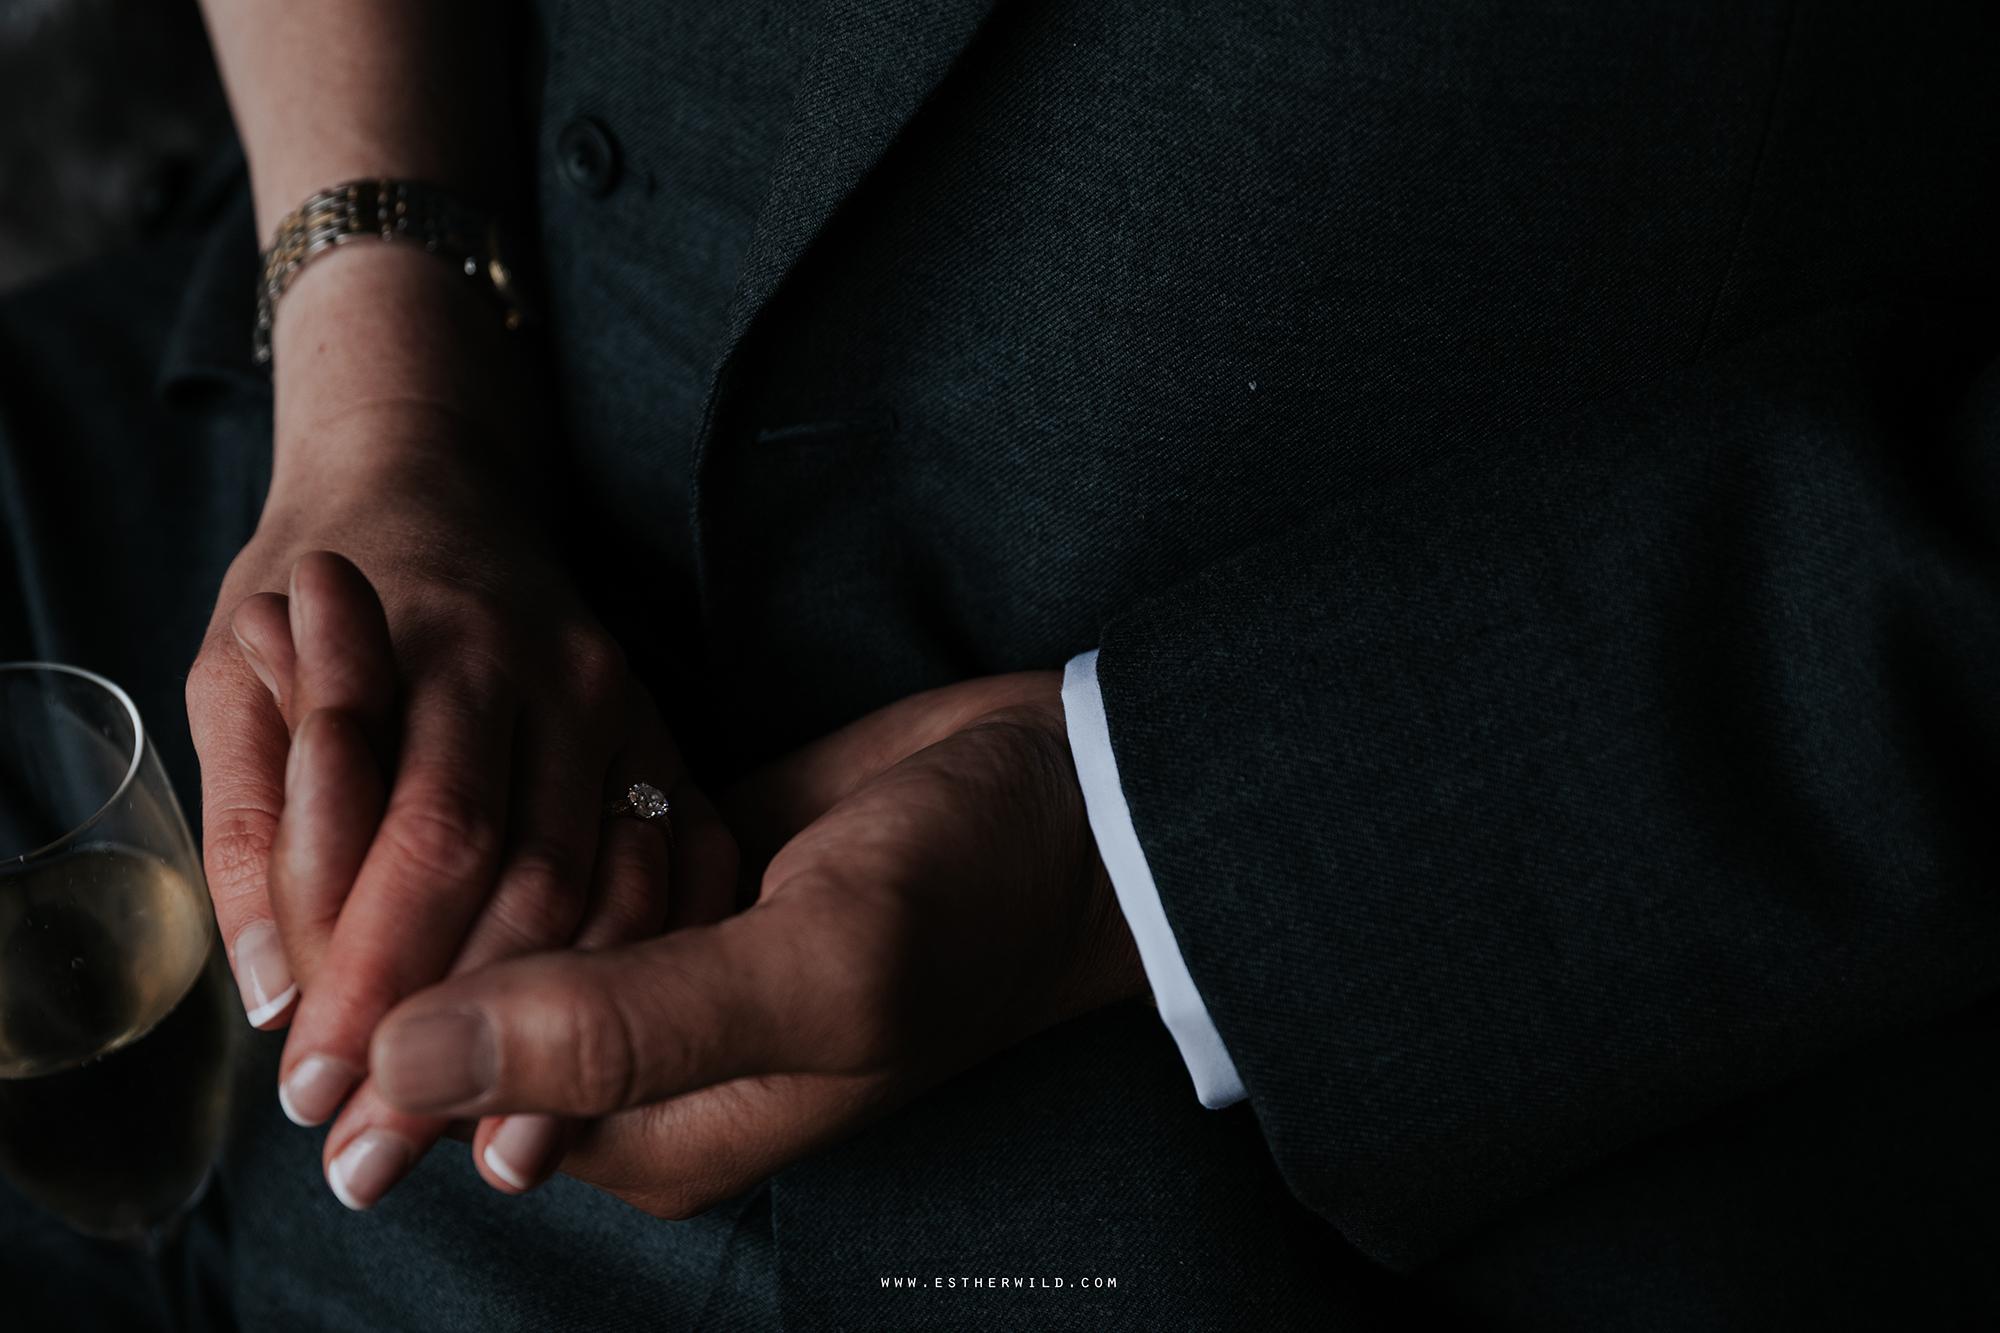 Voewood_Wedding_Norfolk_Photography_Esther_Wild_Photographer_IMG_2007.jpg